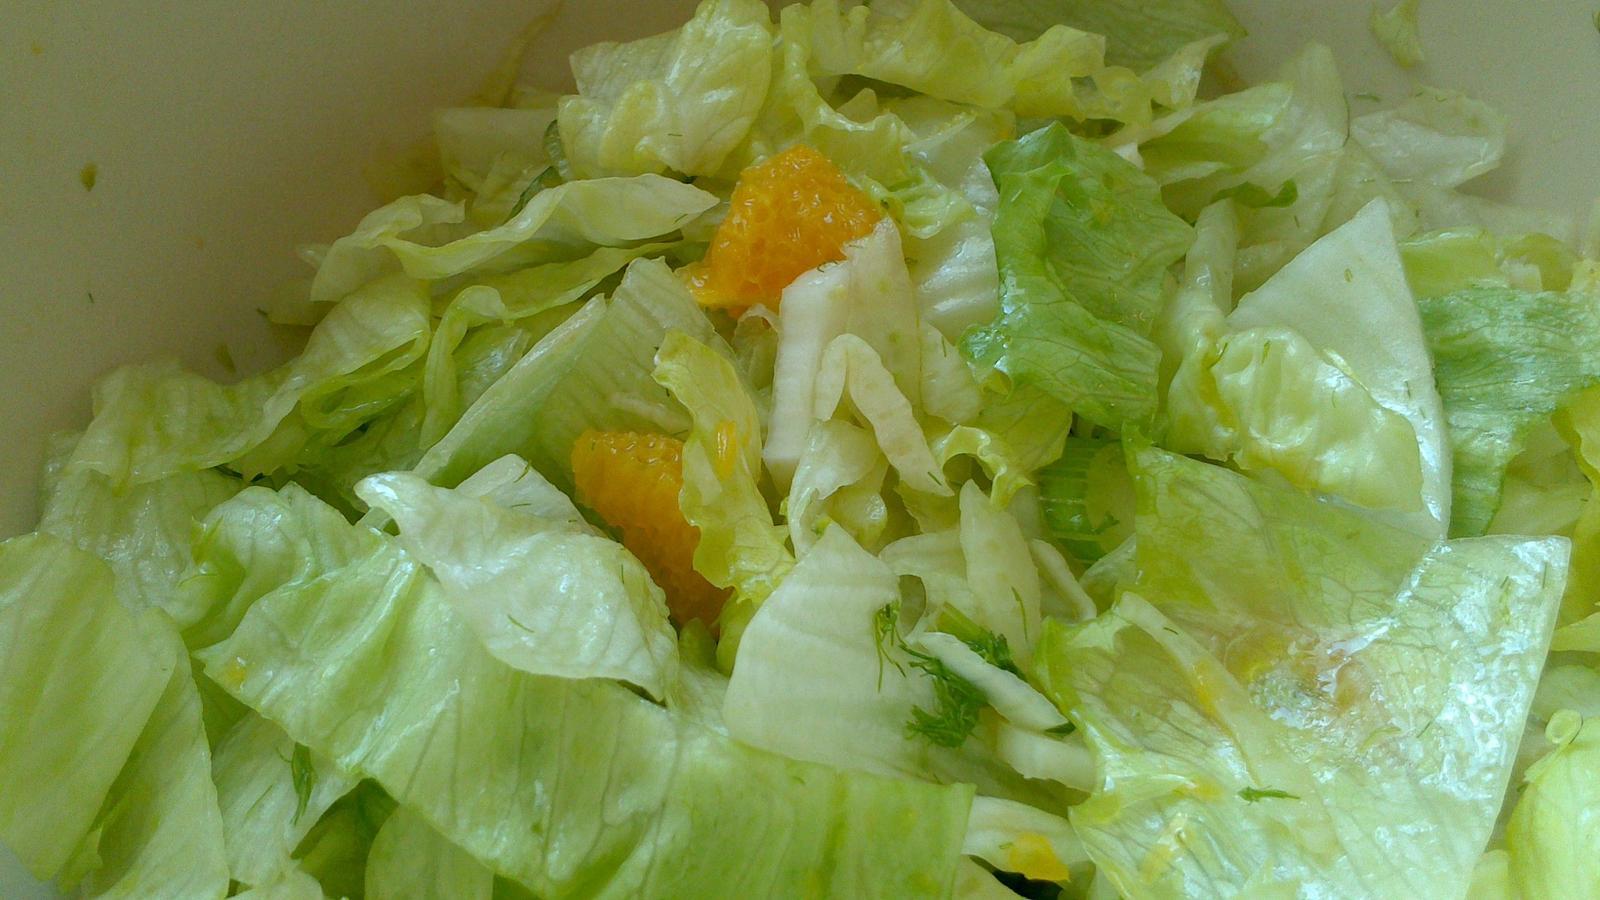 A občas i vařím... - Jednoduchý salát - fenykl, pomeranč, ledový salát, olivový olej